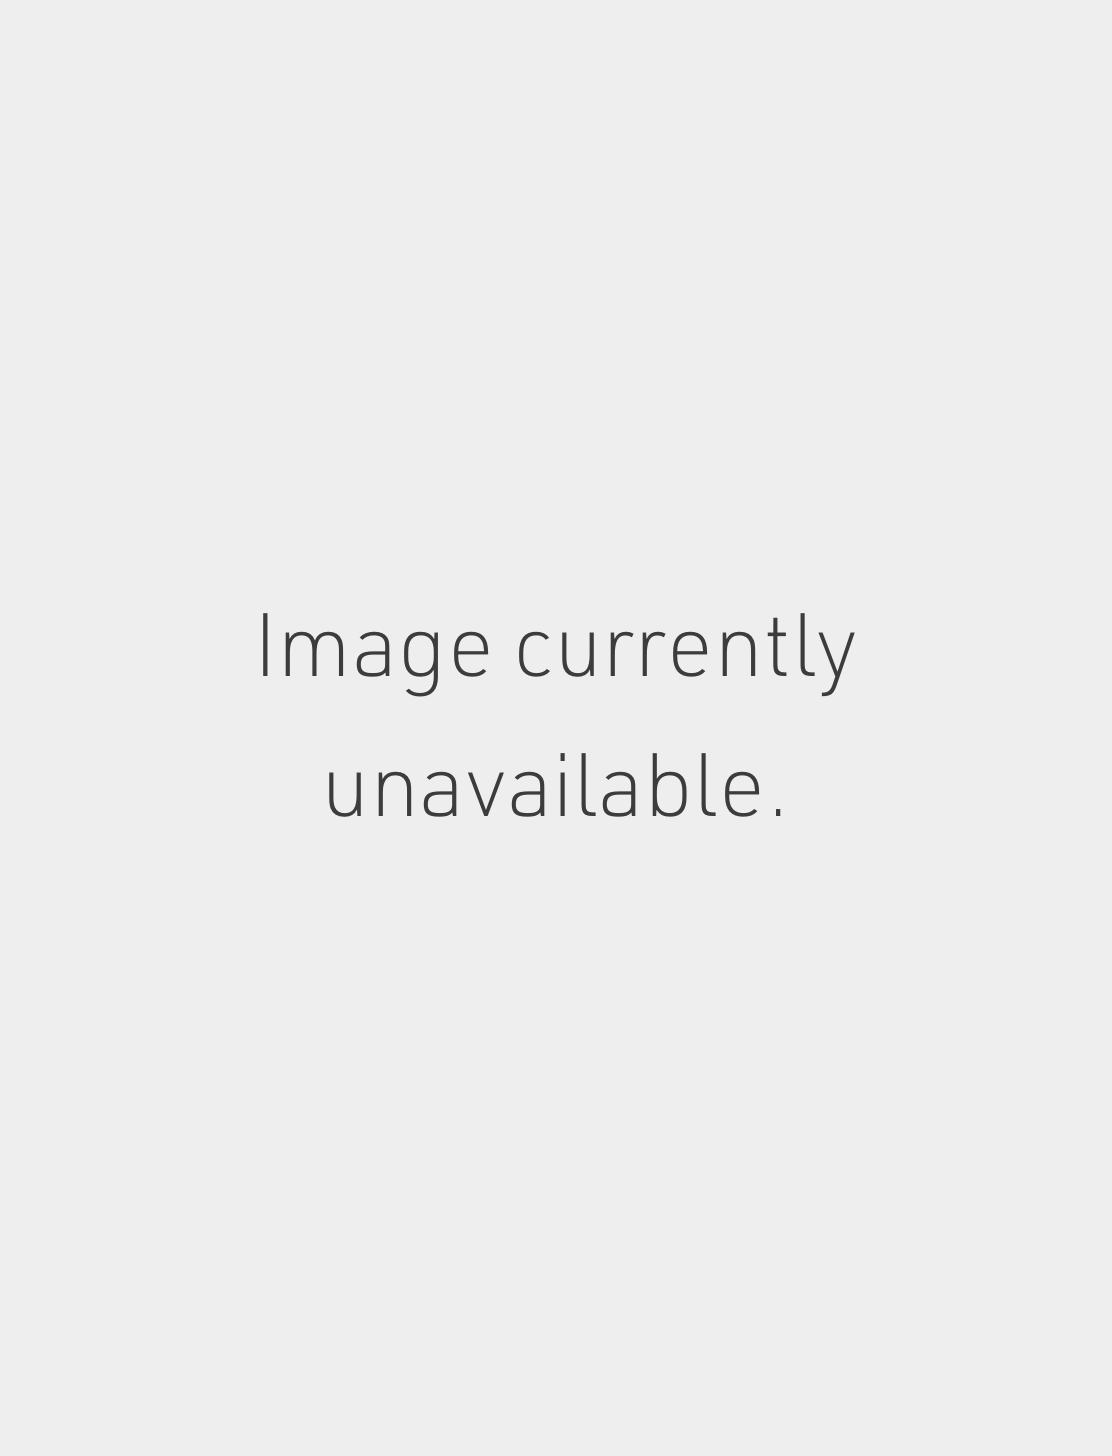 Scalloped Round and Pear Diamond Orbital Image #1